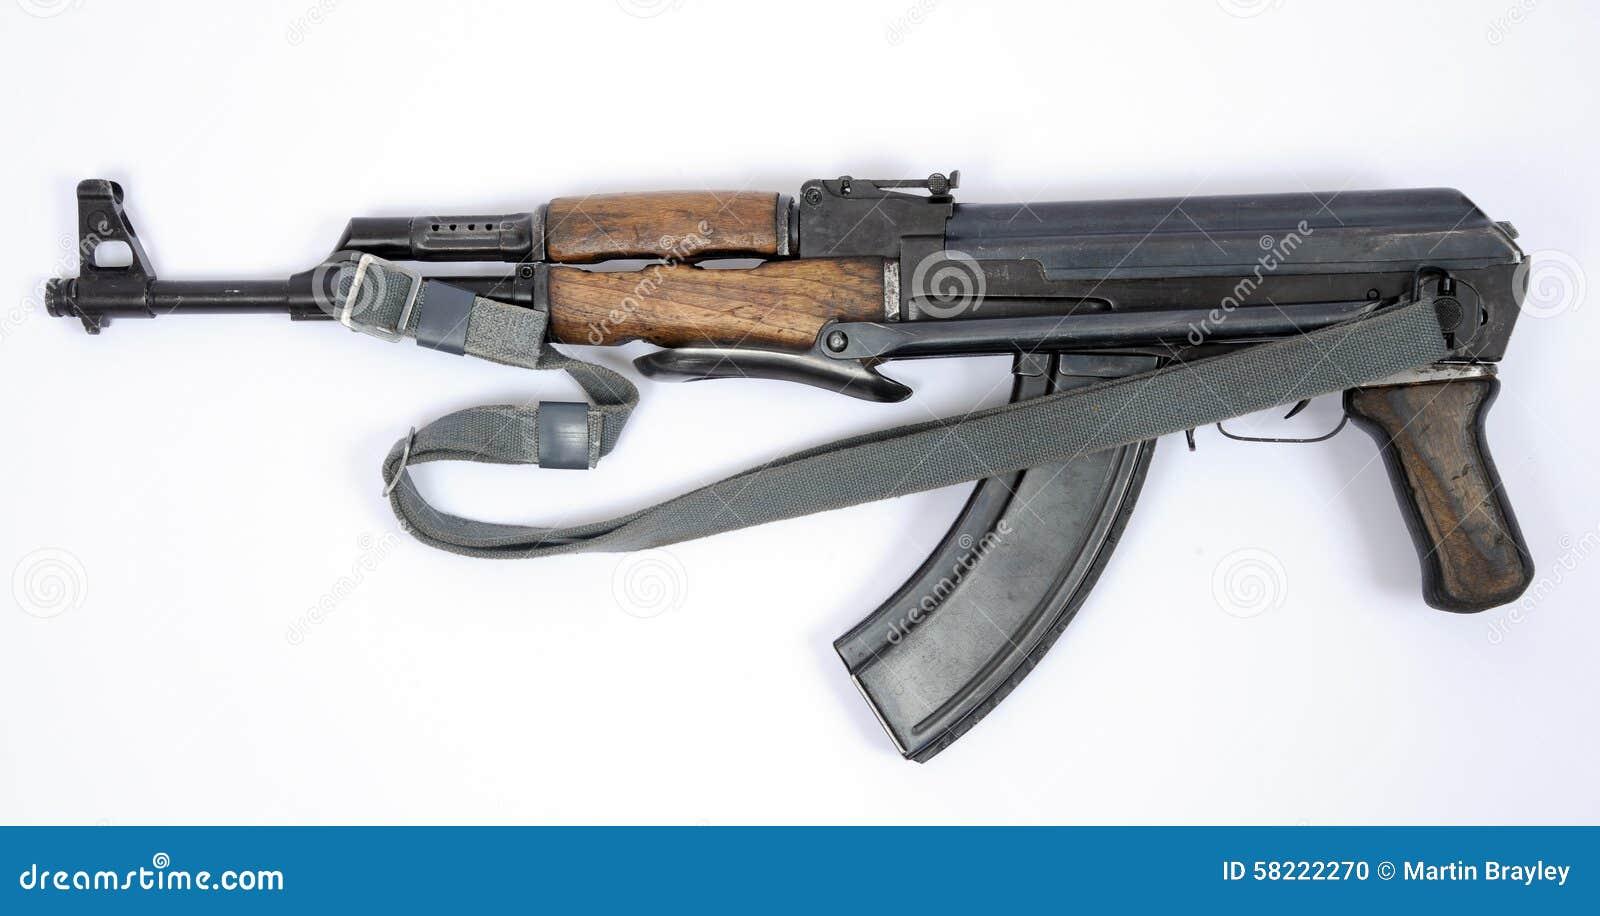 East German Kalashnikov AK47 assault rifle